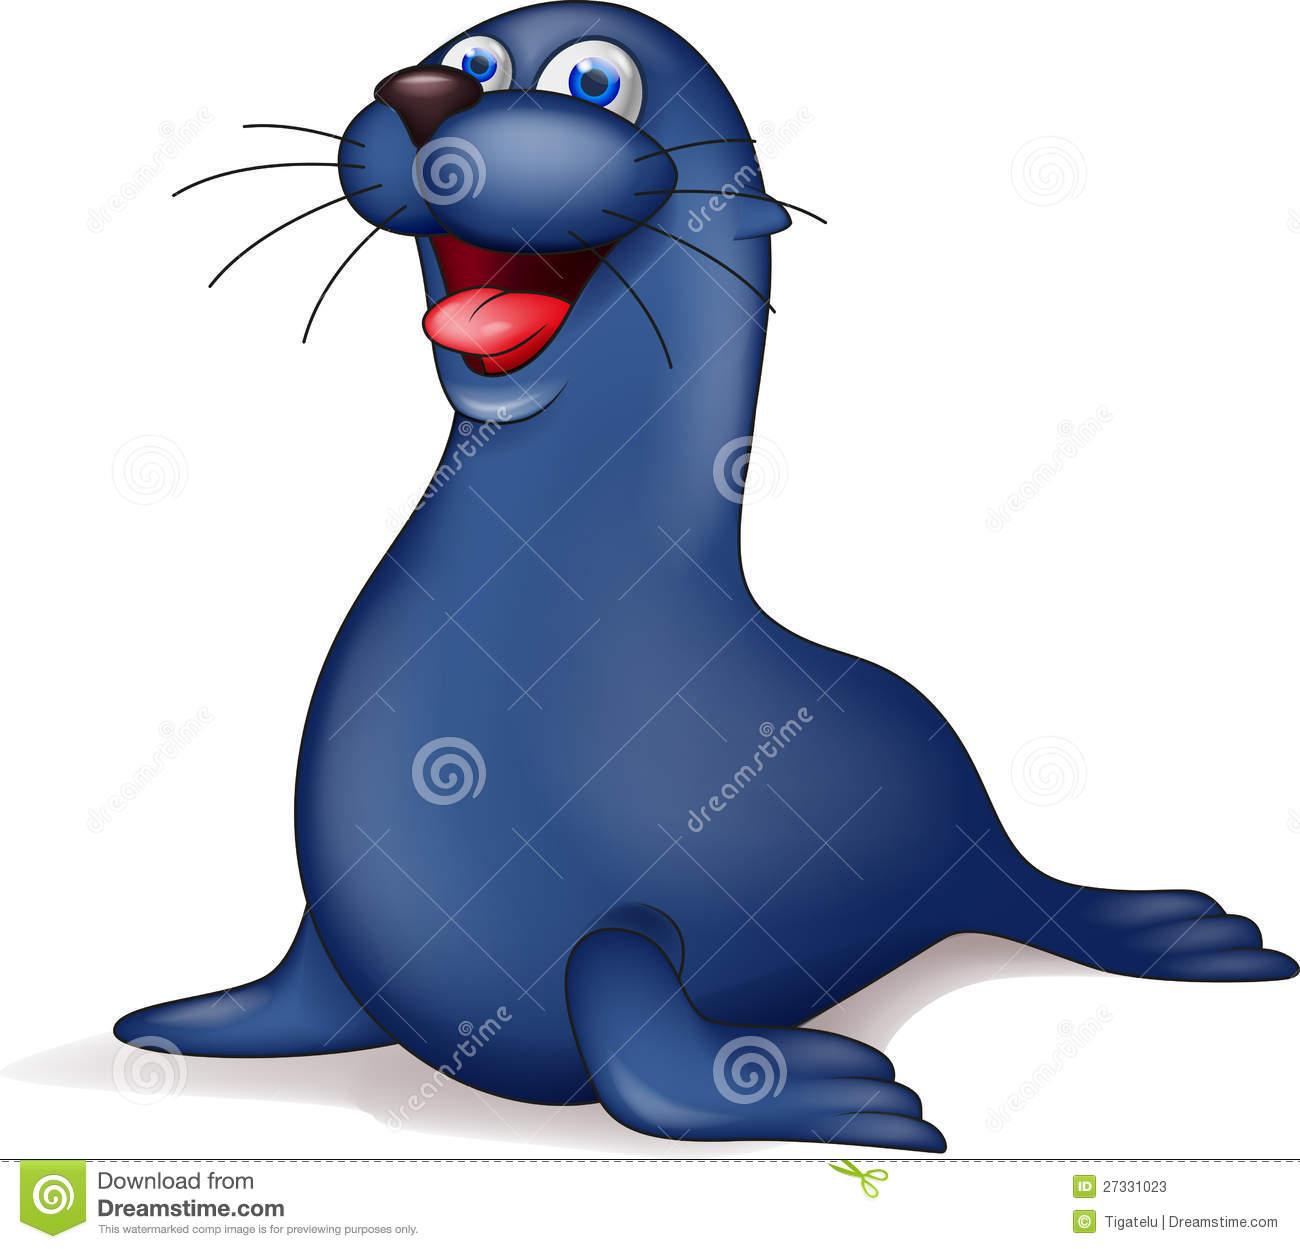 Seal cartoon stock vector. Illustration of funny, clipart.